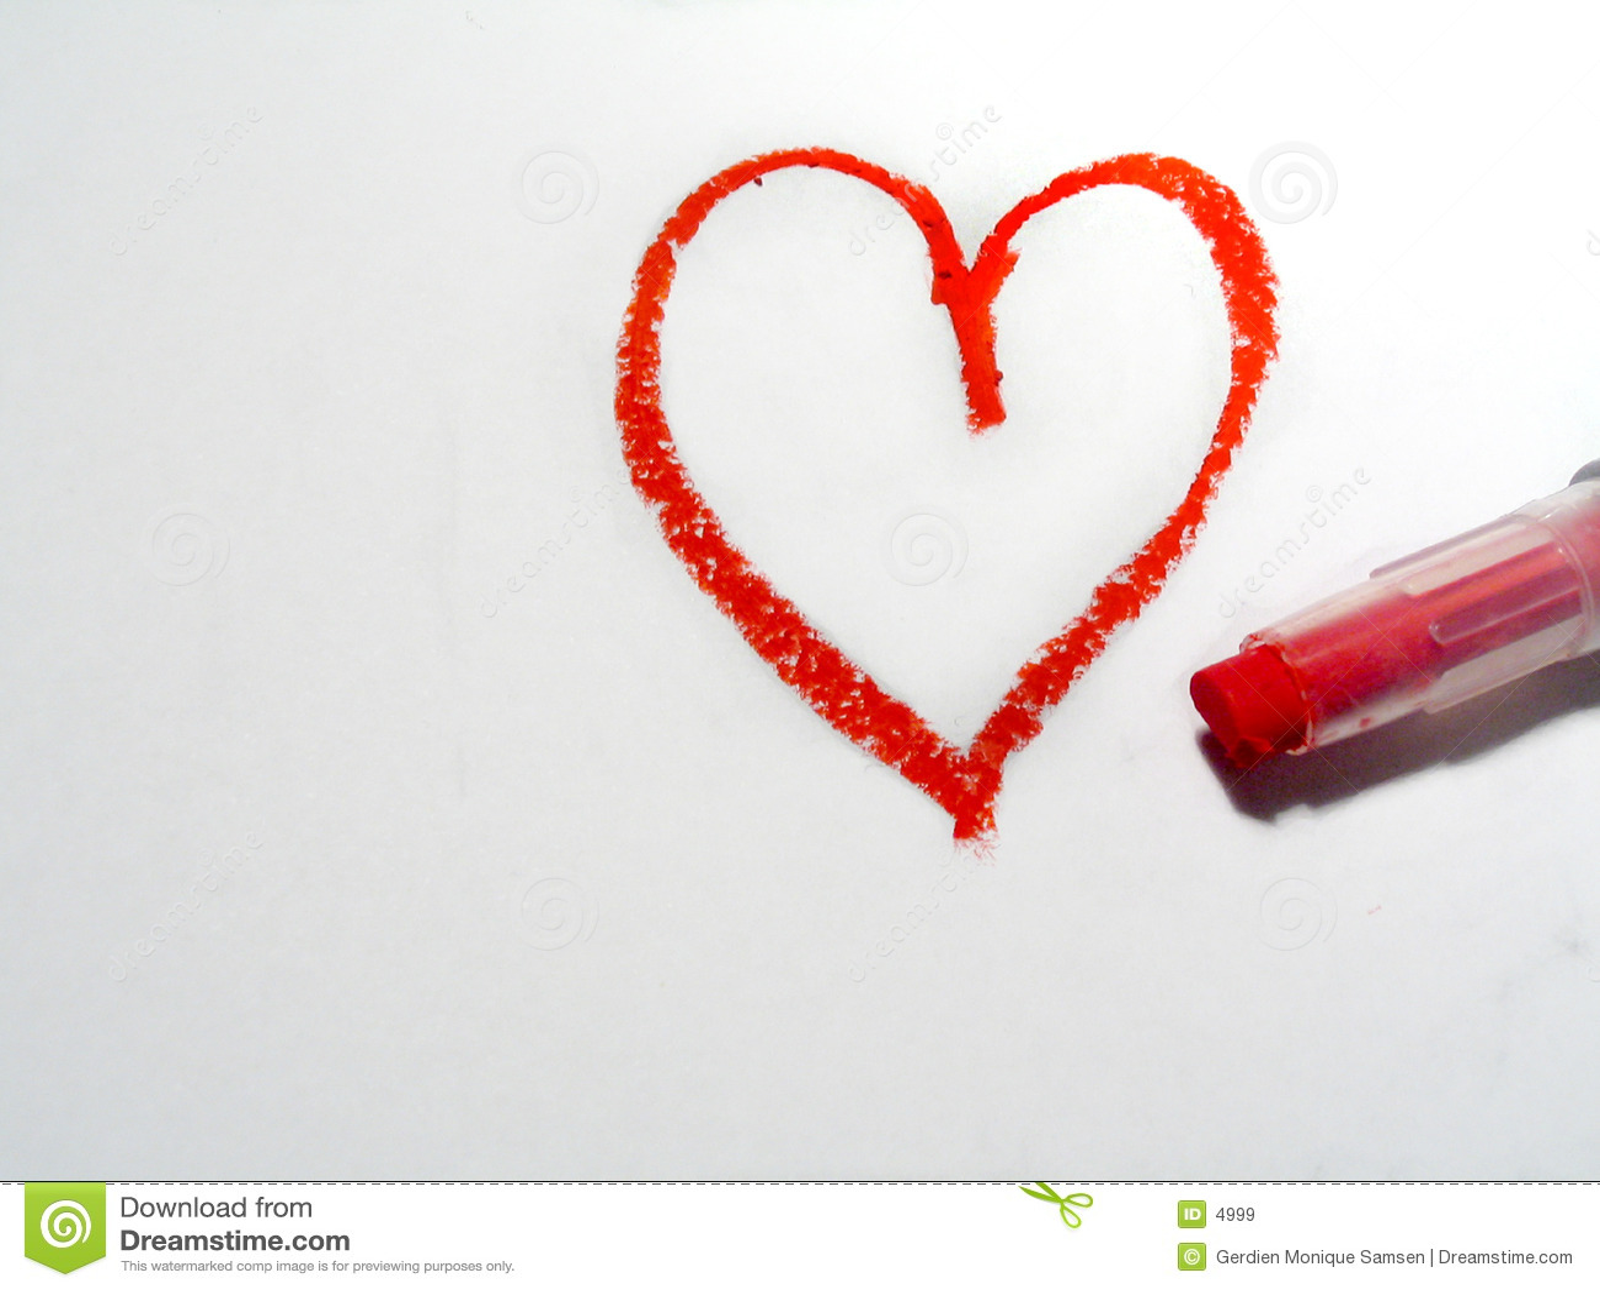 Oilpastel Heart